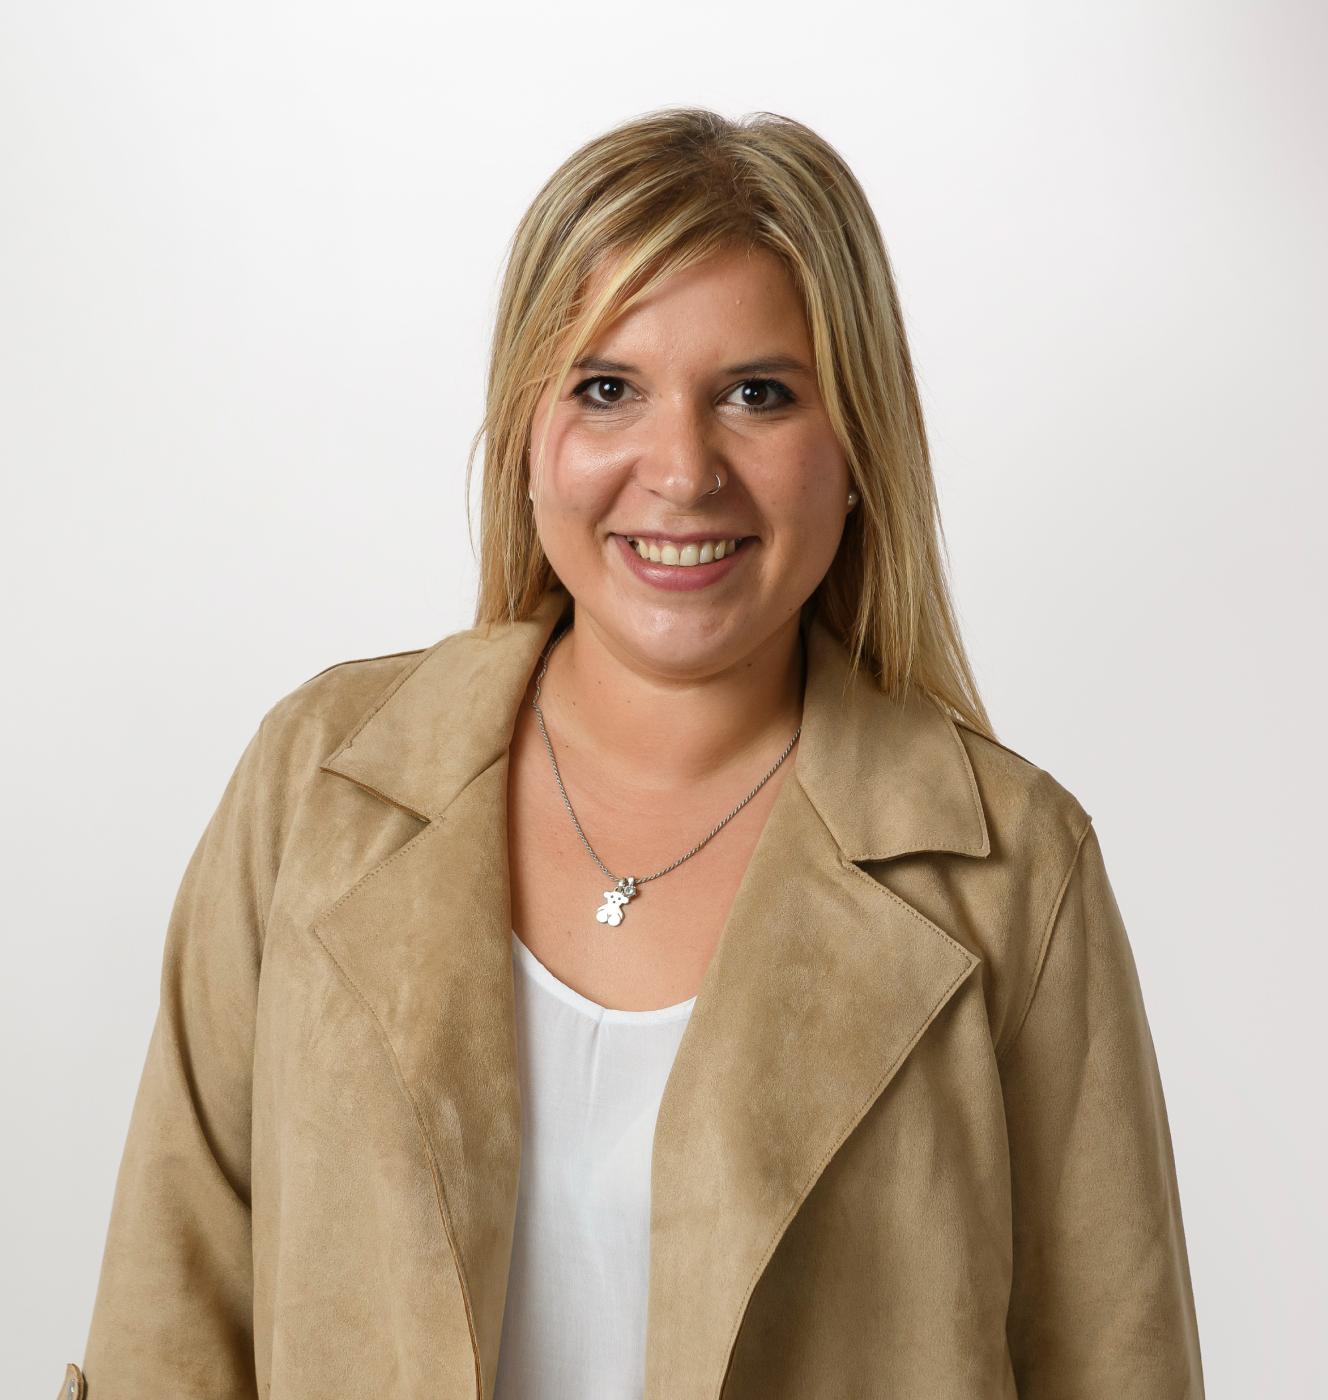 Paola Karina, experta inmobiliaria en Gavà - Vida Mejor Inmobiliaria